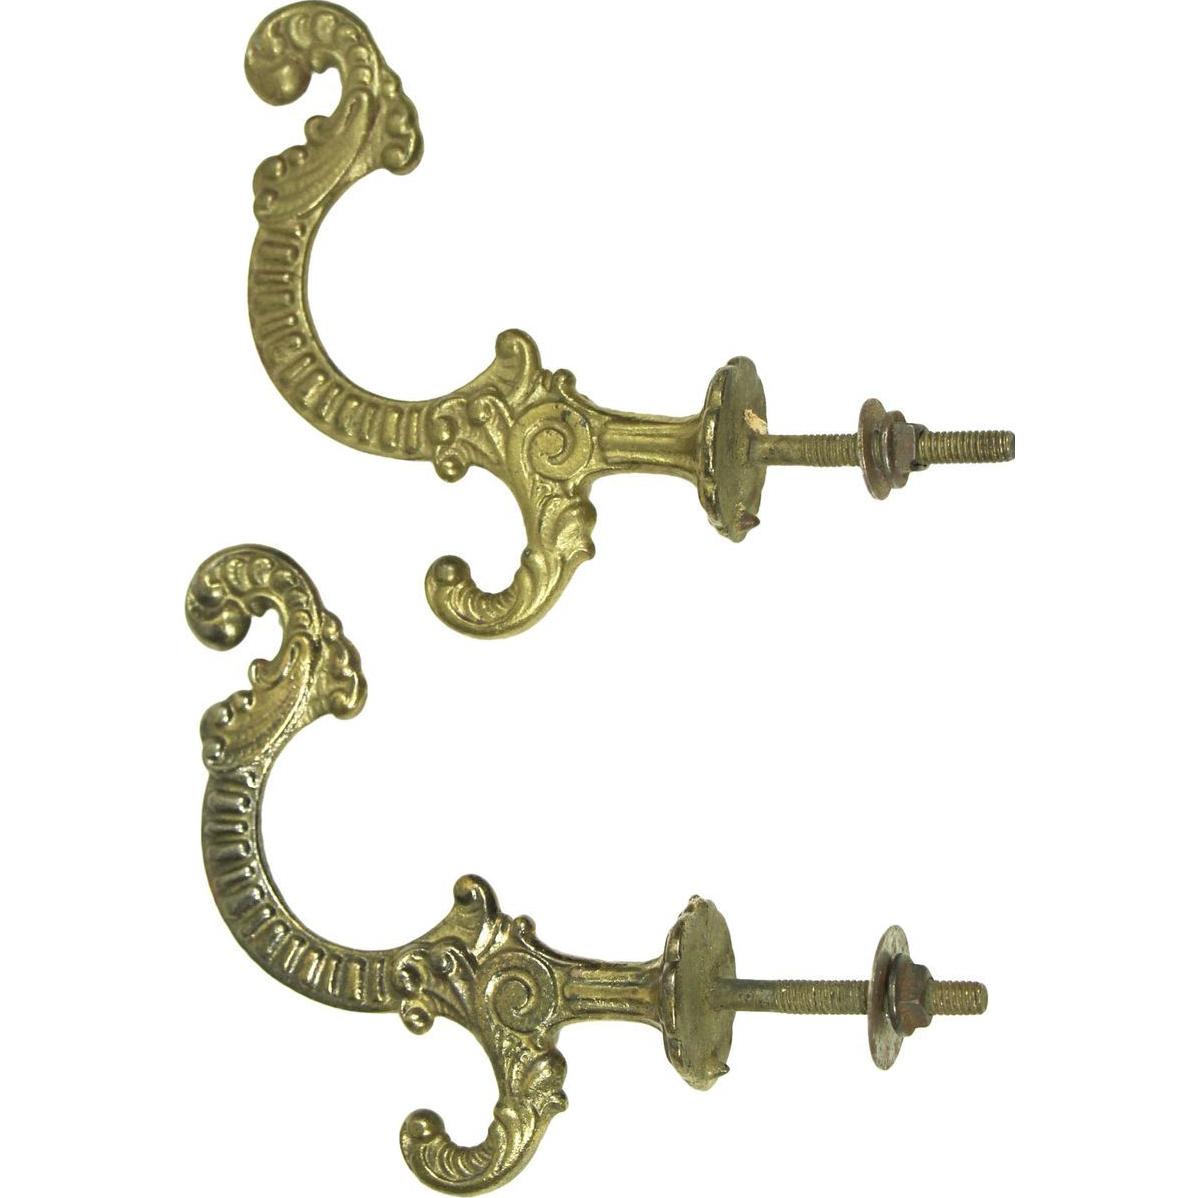 Set of decorative ornate hooks